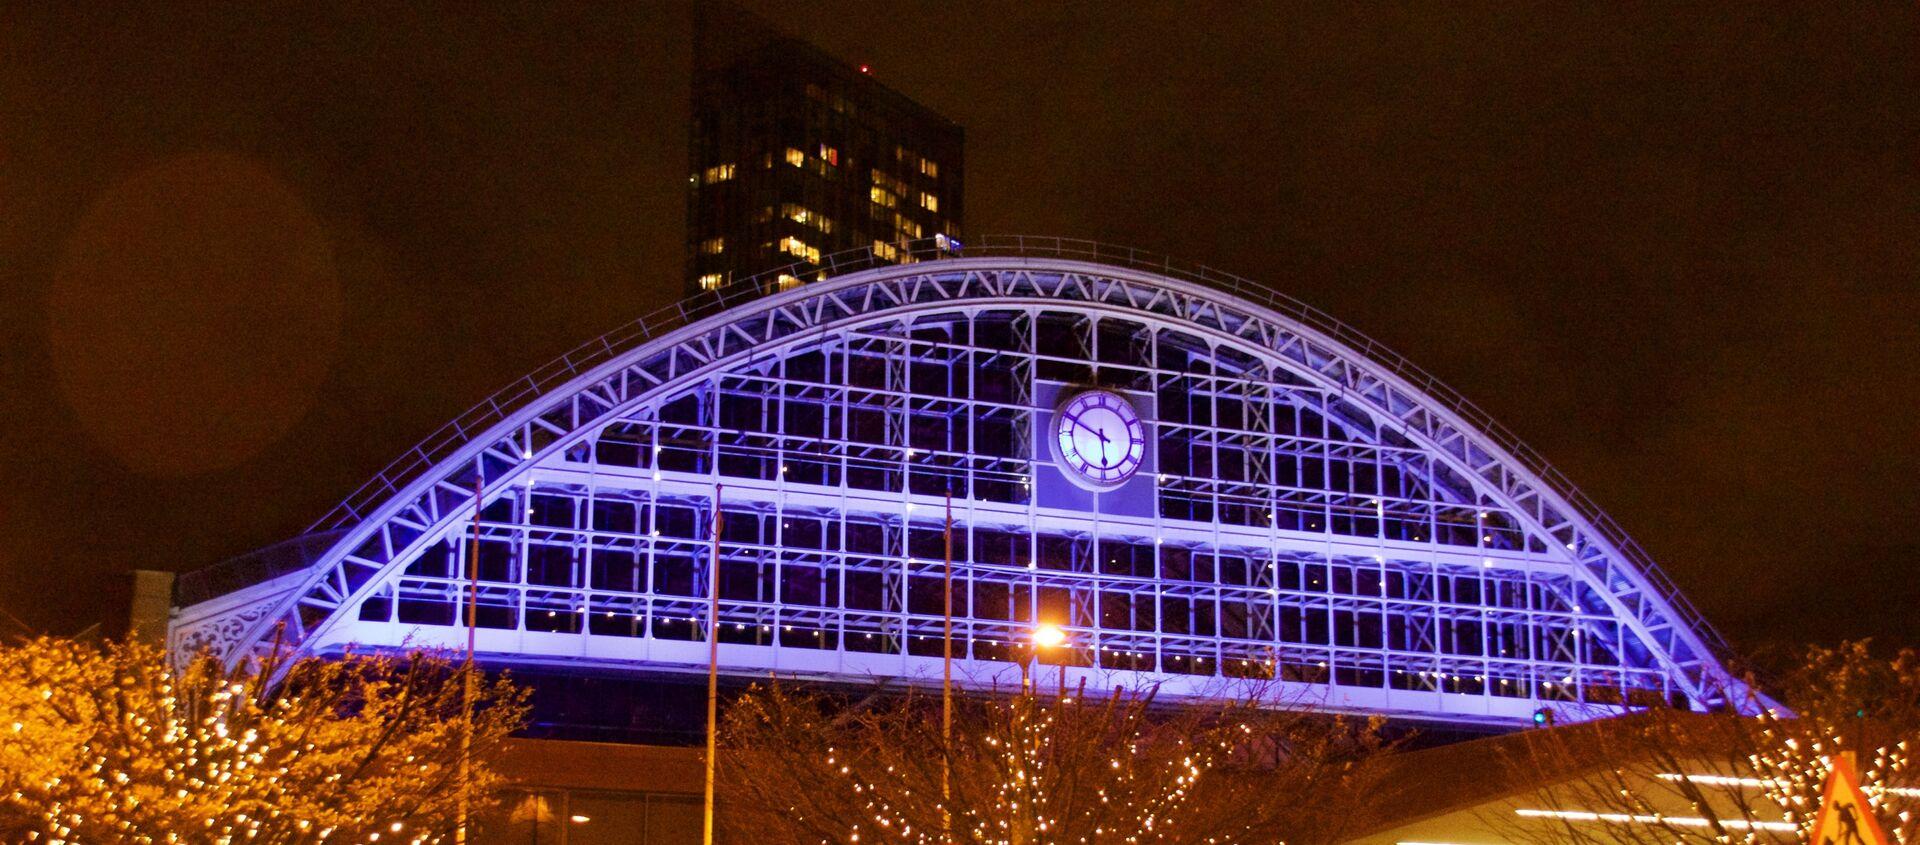 Manchester Central conference centre illuminated in December 2015. Manchester, UK - Sputnik International, 1920, 22.07.2021